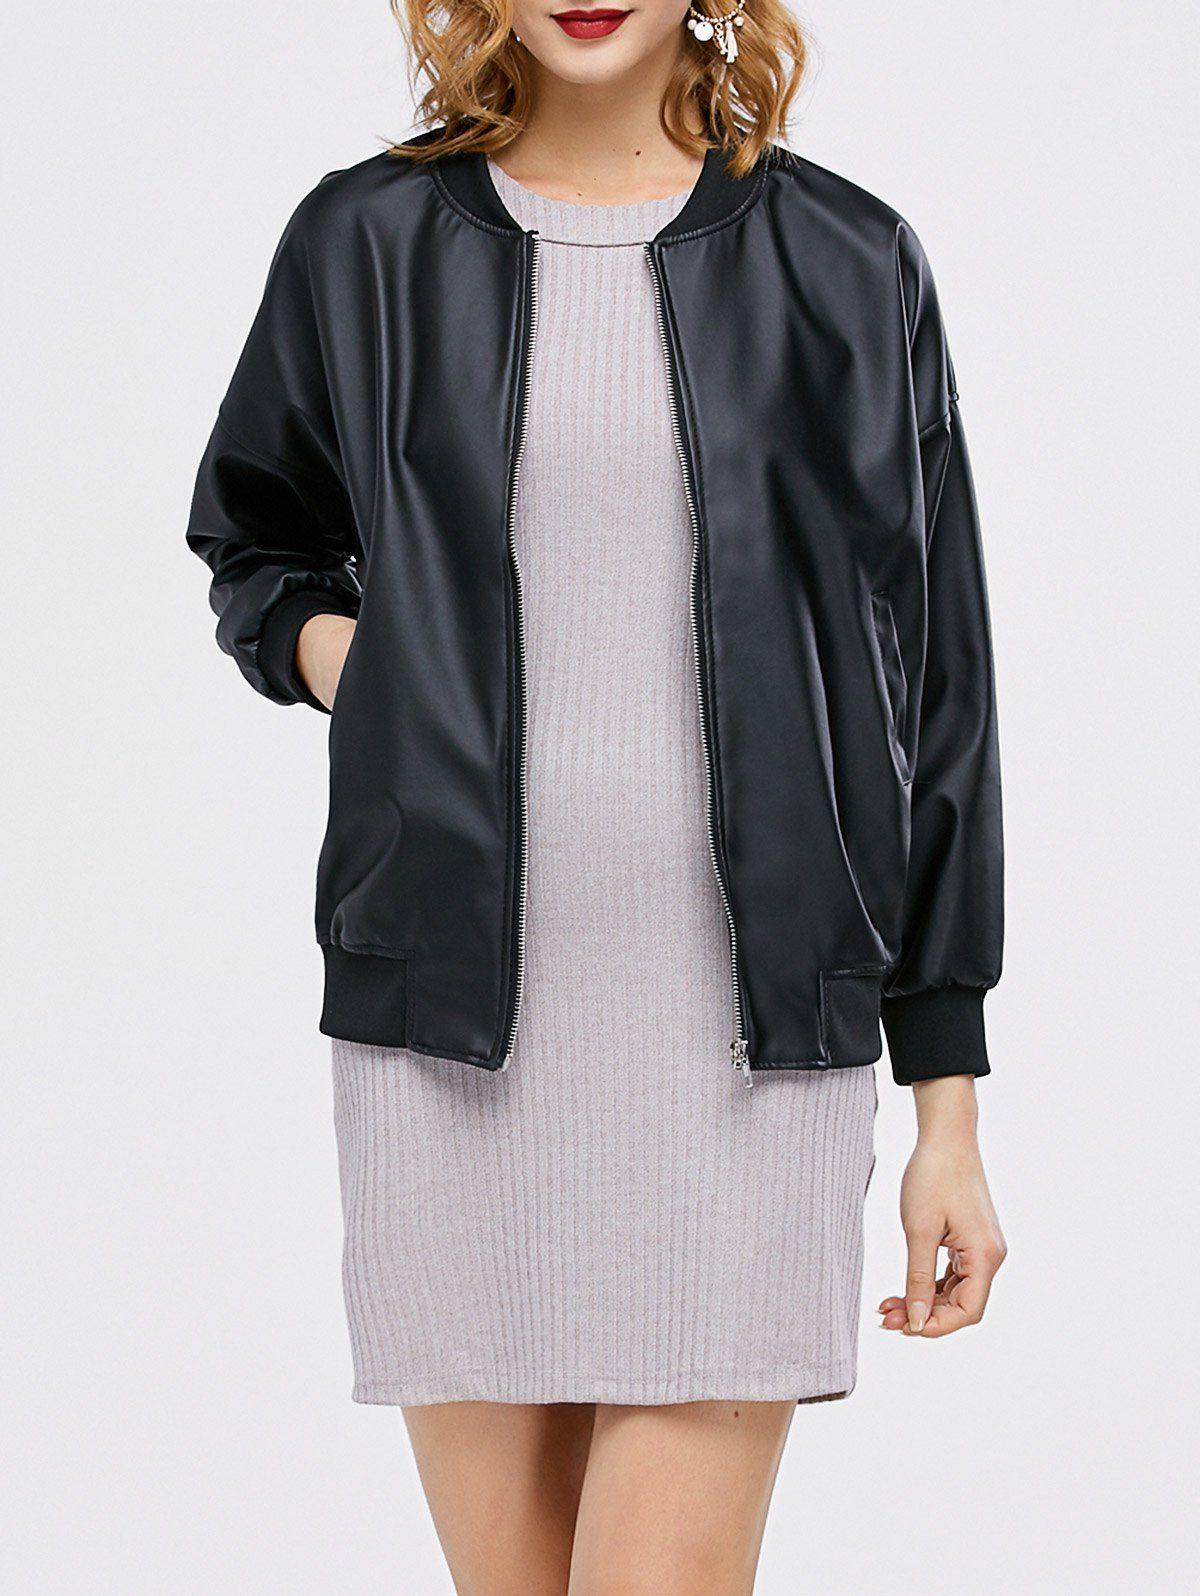 Zipped PU Leather Bomber Jacket Women outerwear jacket